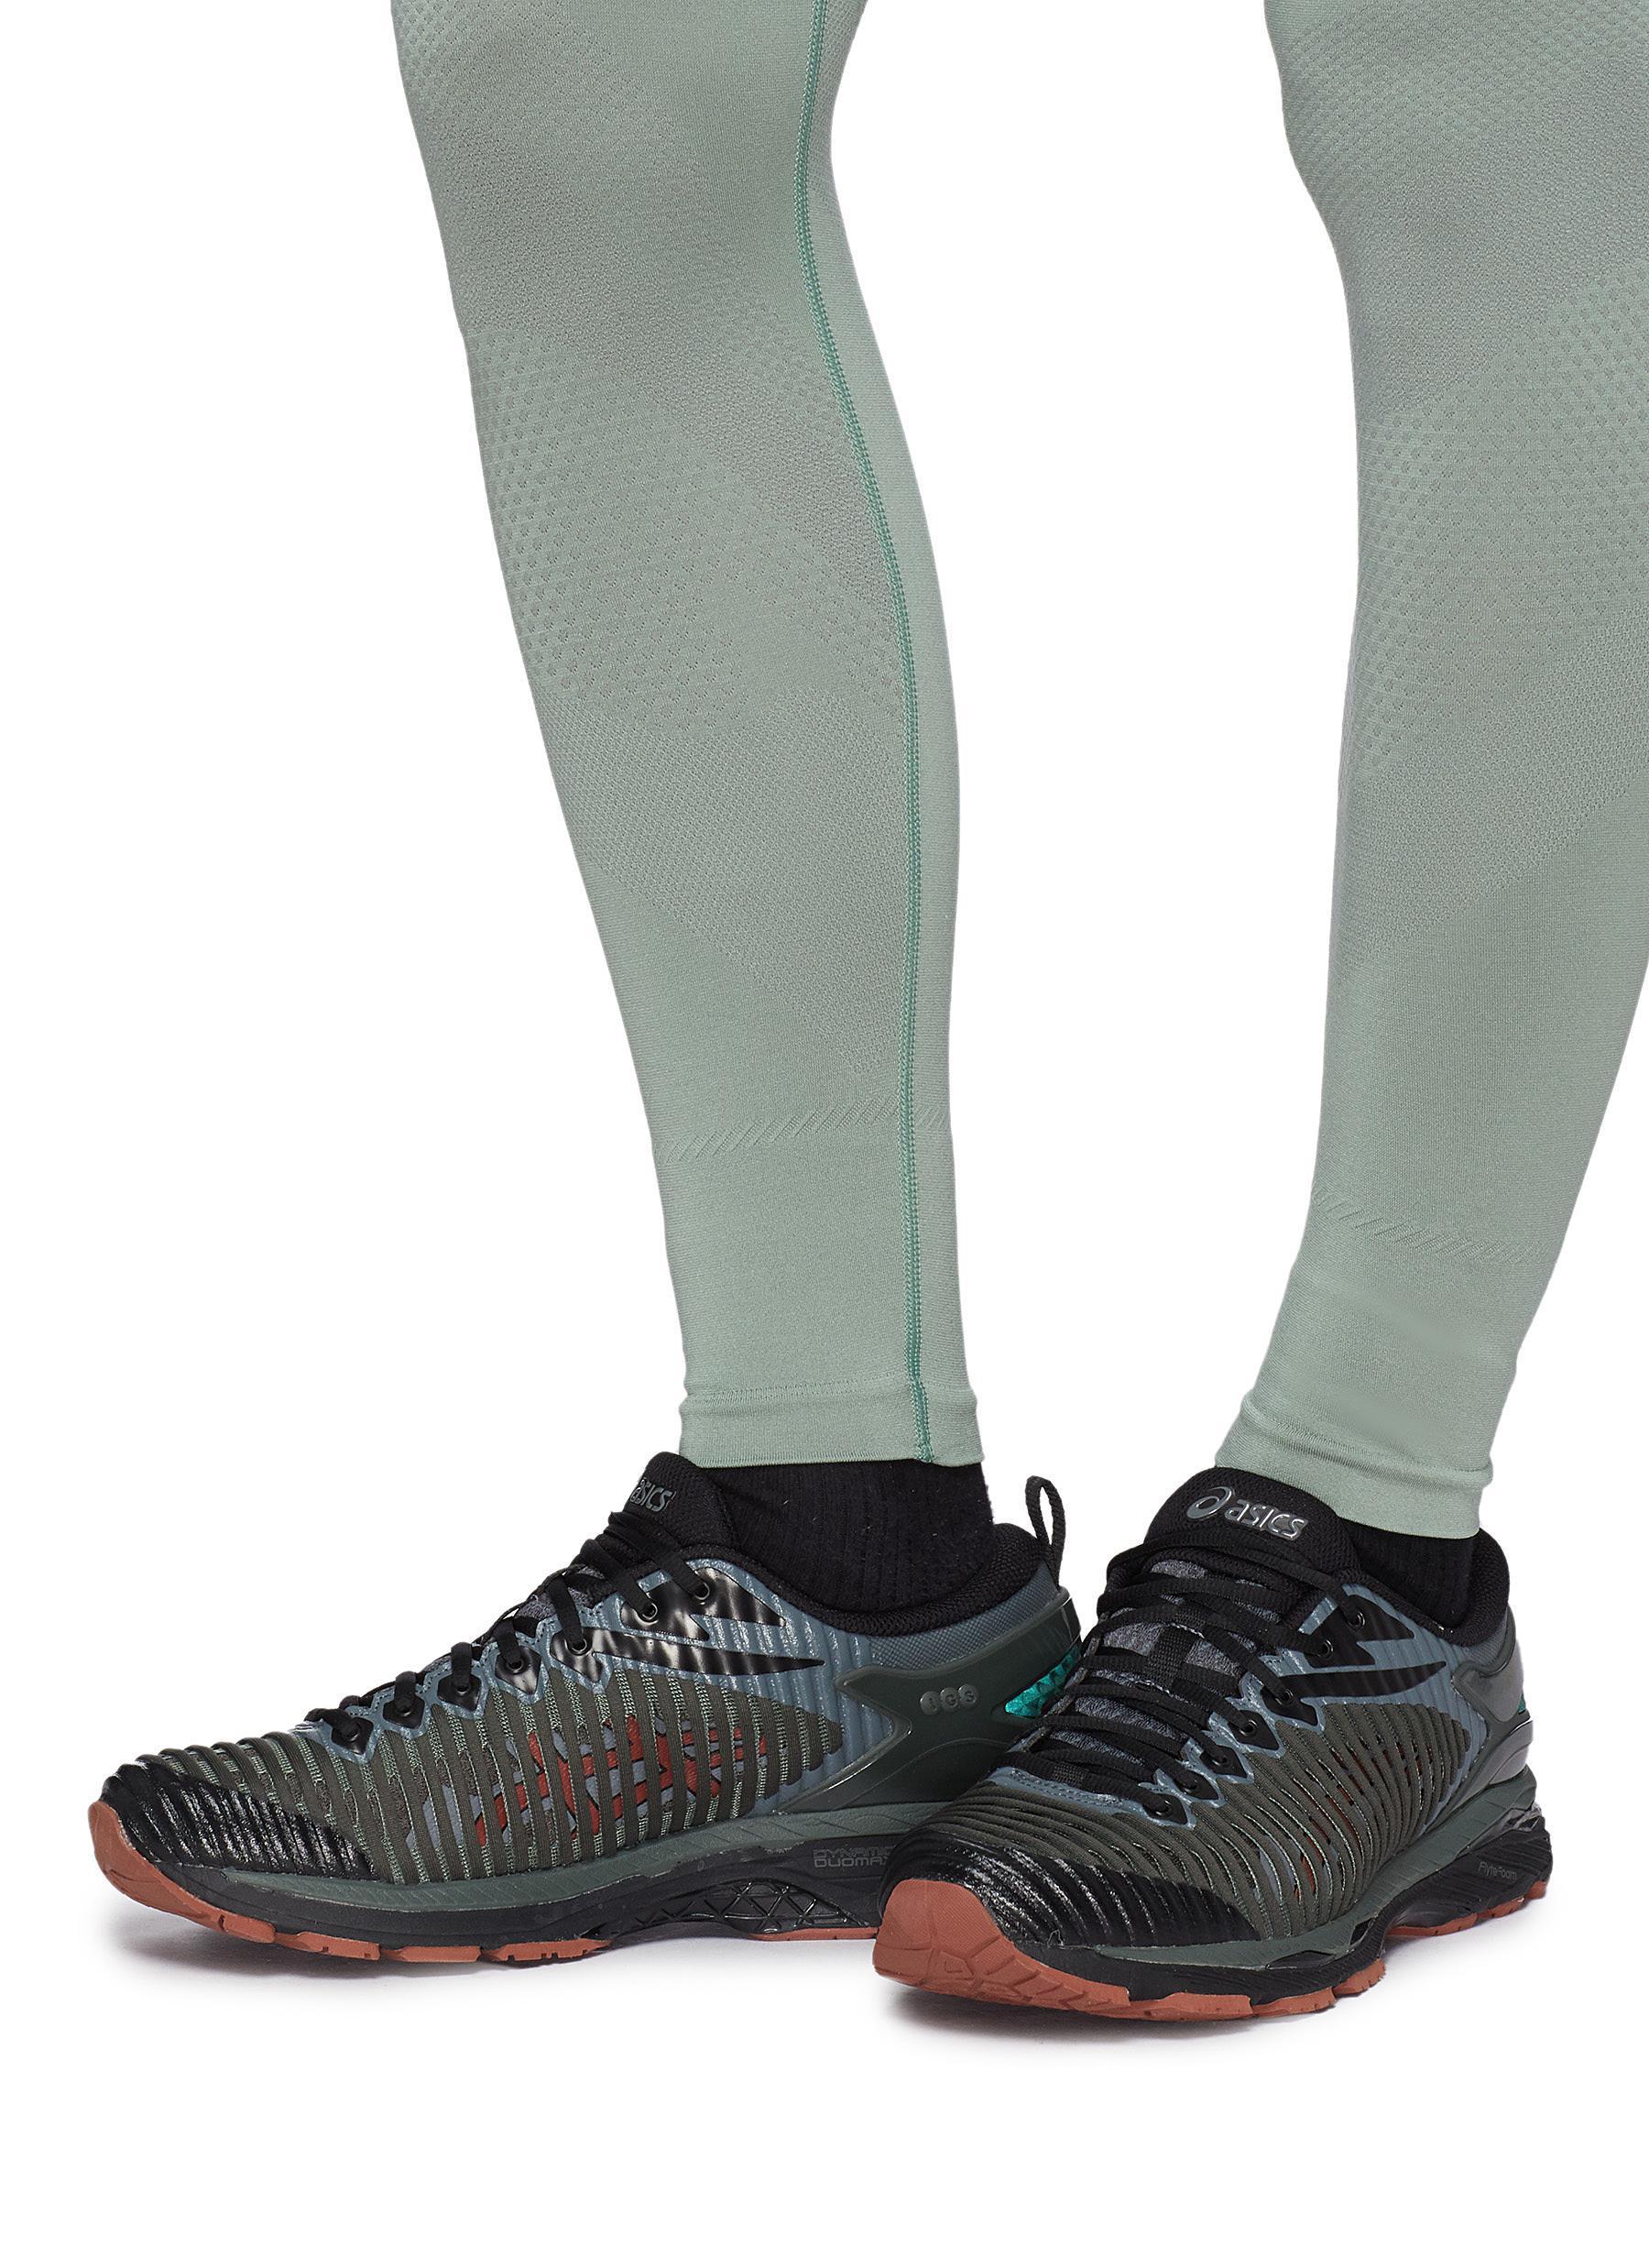 'gel X Asics 1' For Delva Men Kiko Kostadinov Patchwork Lyst Sneakers aqIxwO7q